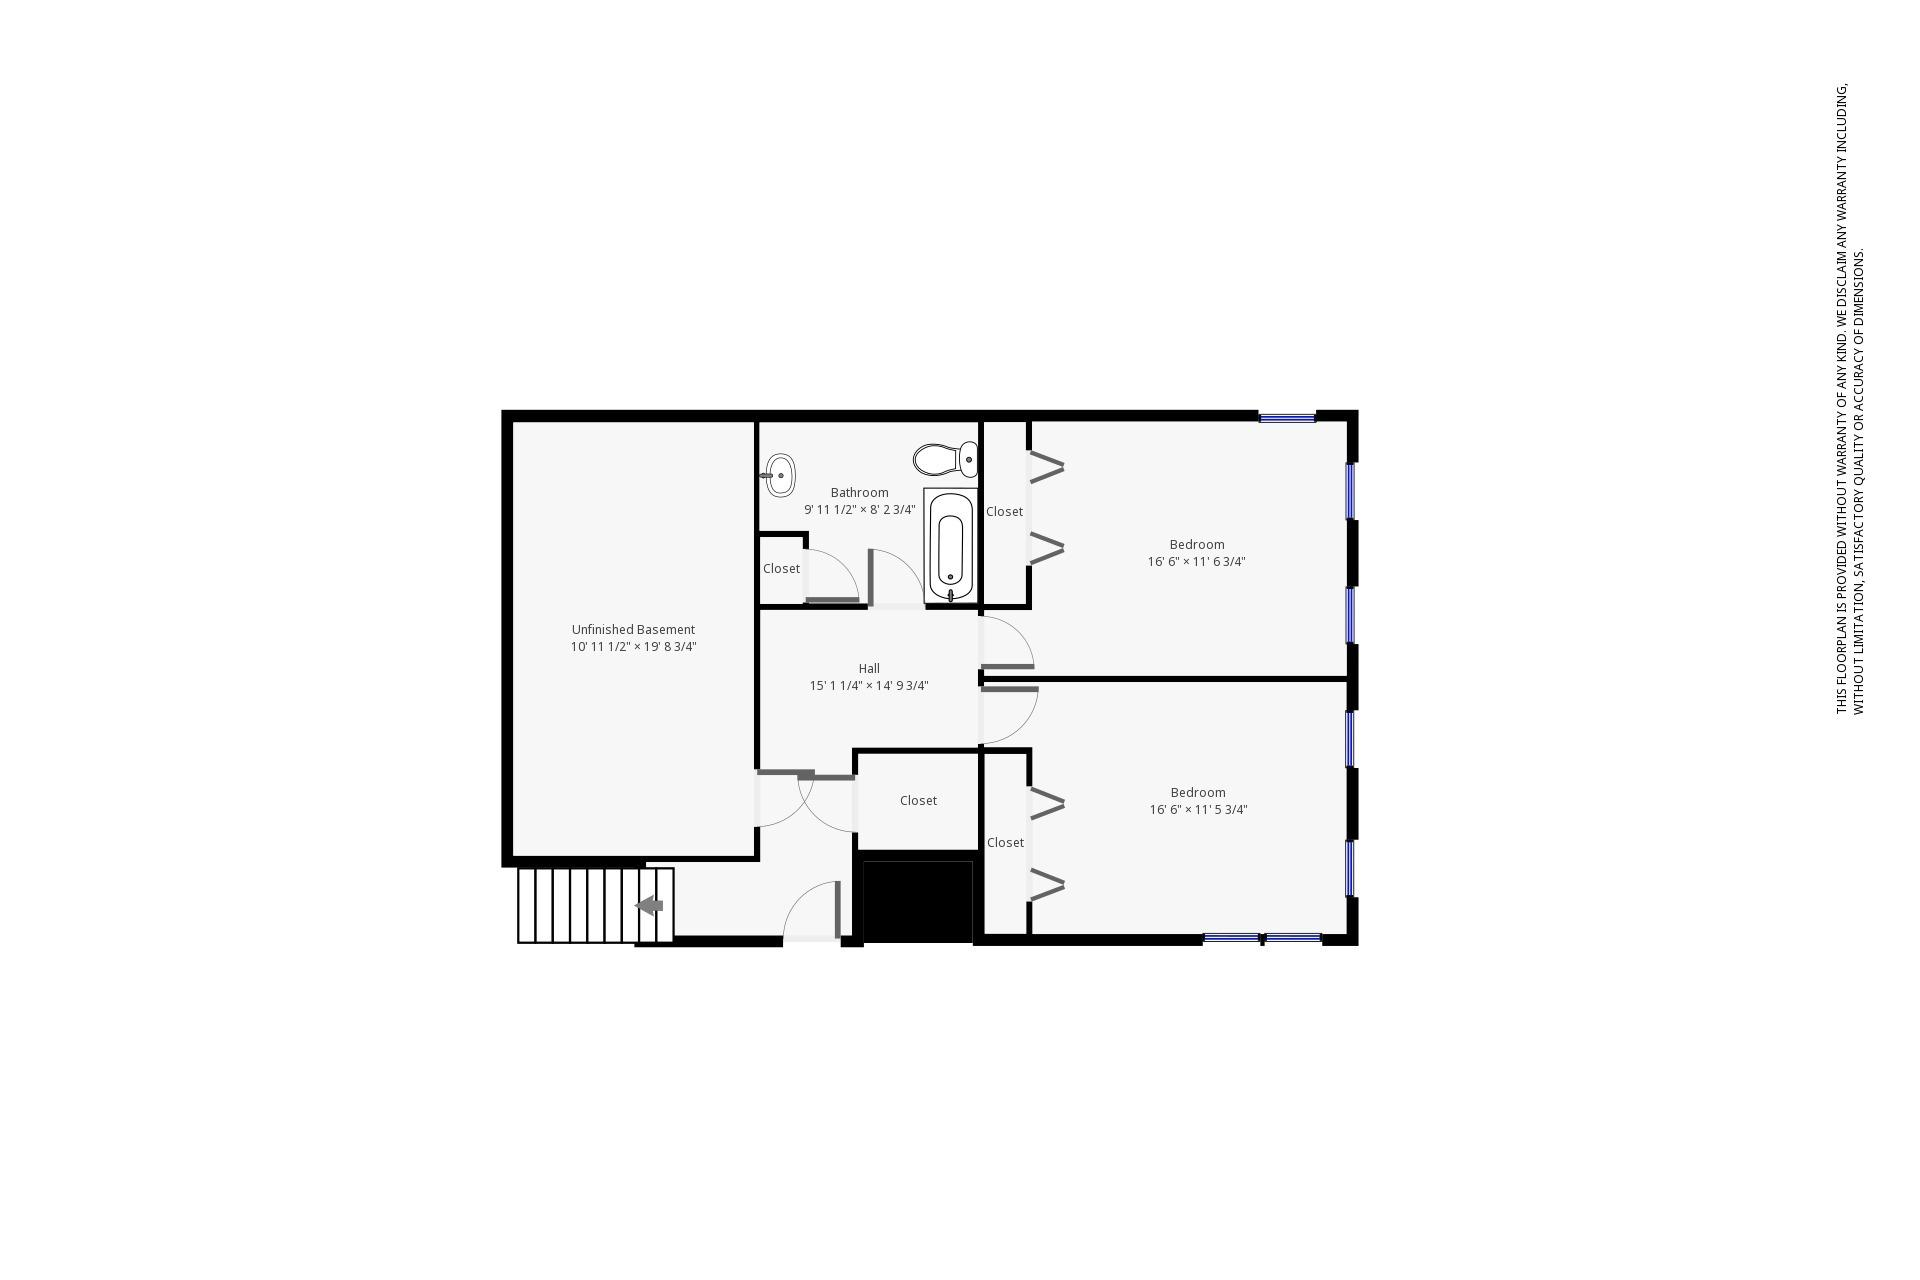 331 main street chatham ma 02633 property image 48